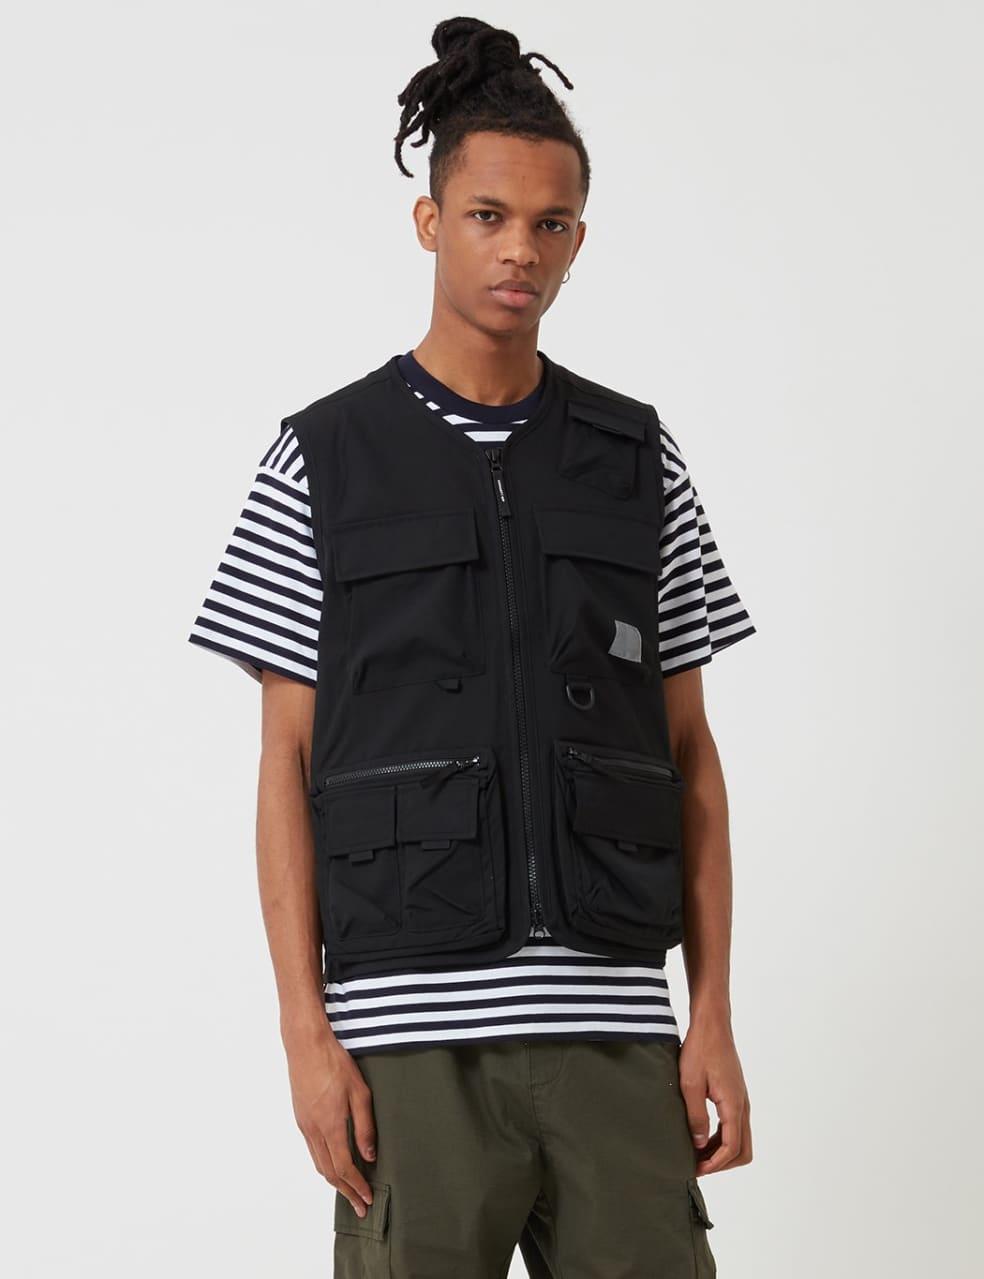 Carhartt-WIP Elmwood Vest (Stretch) - Black | Gilet by Carhartt WIP 1